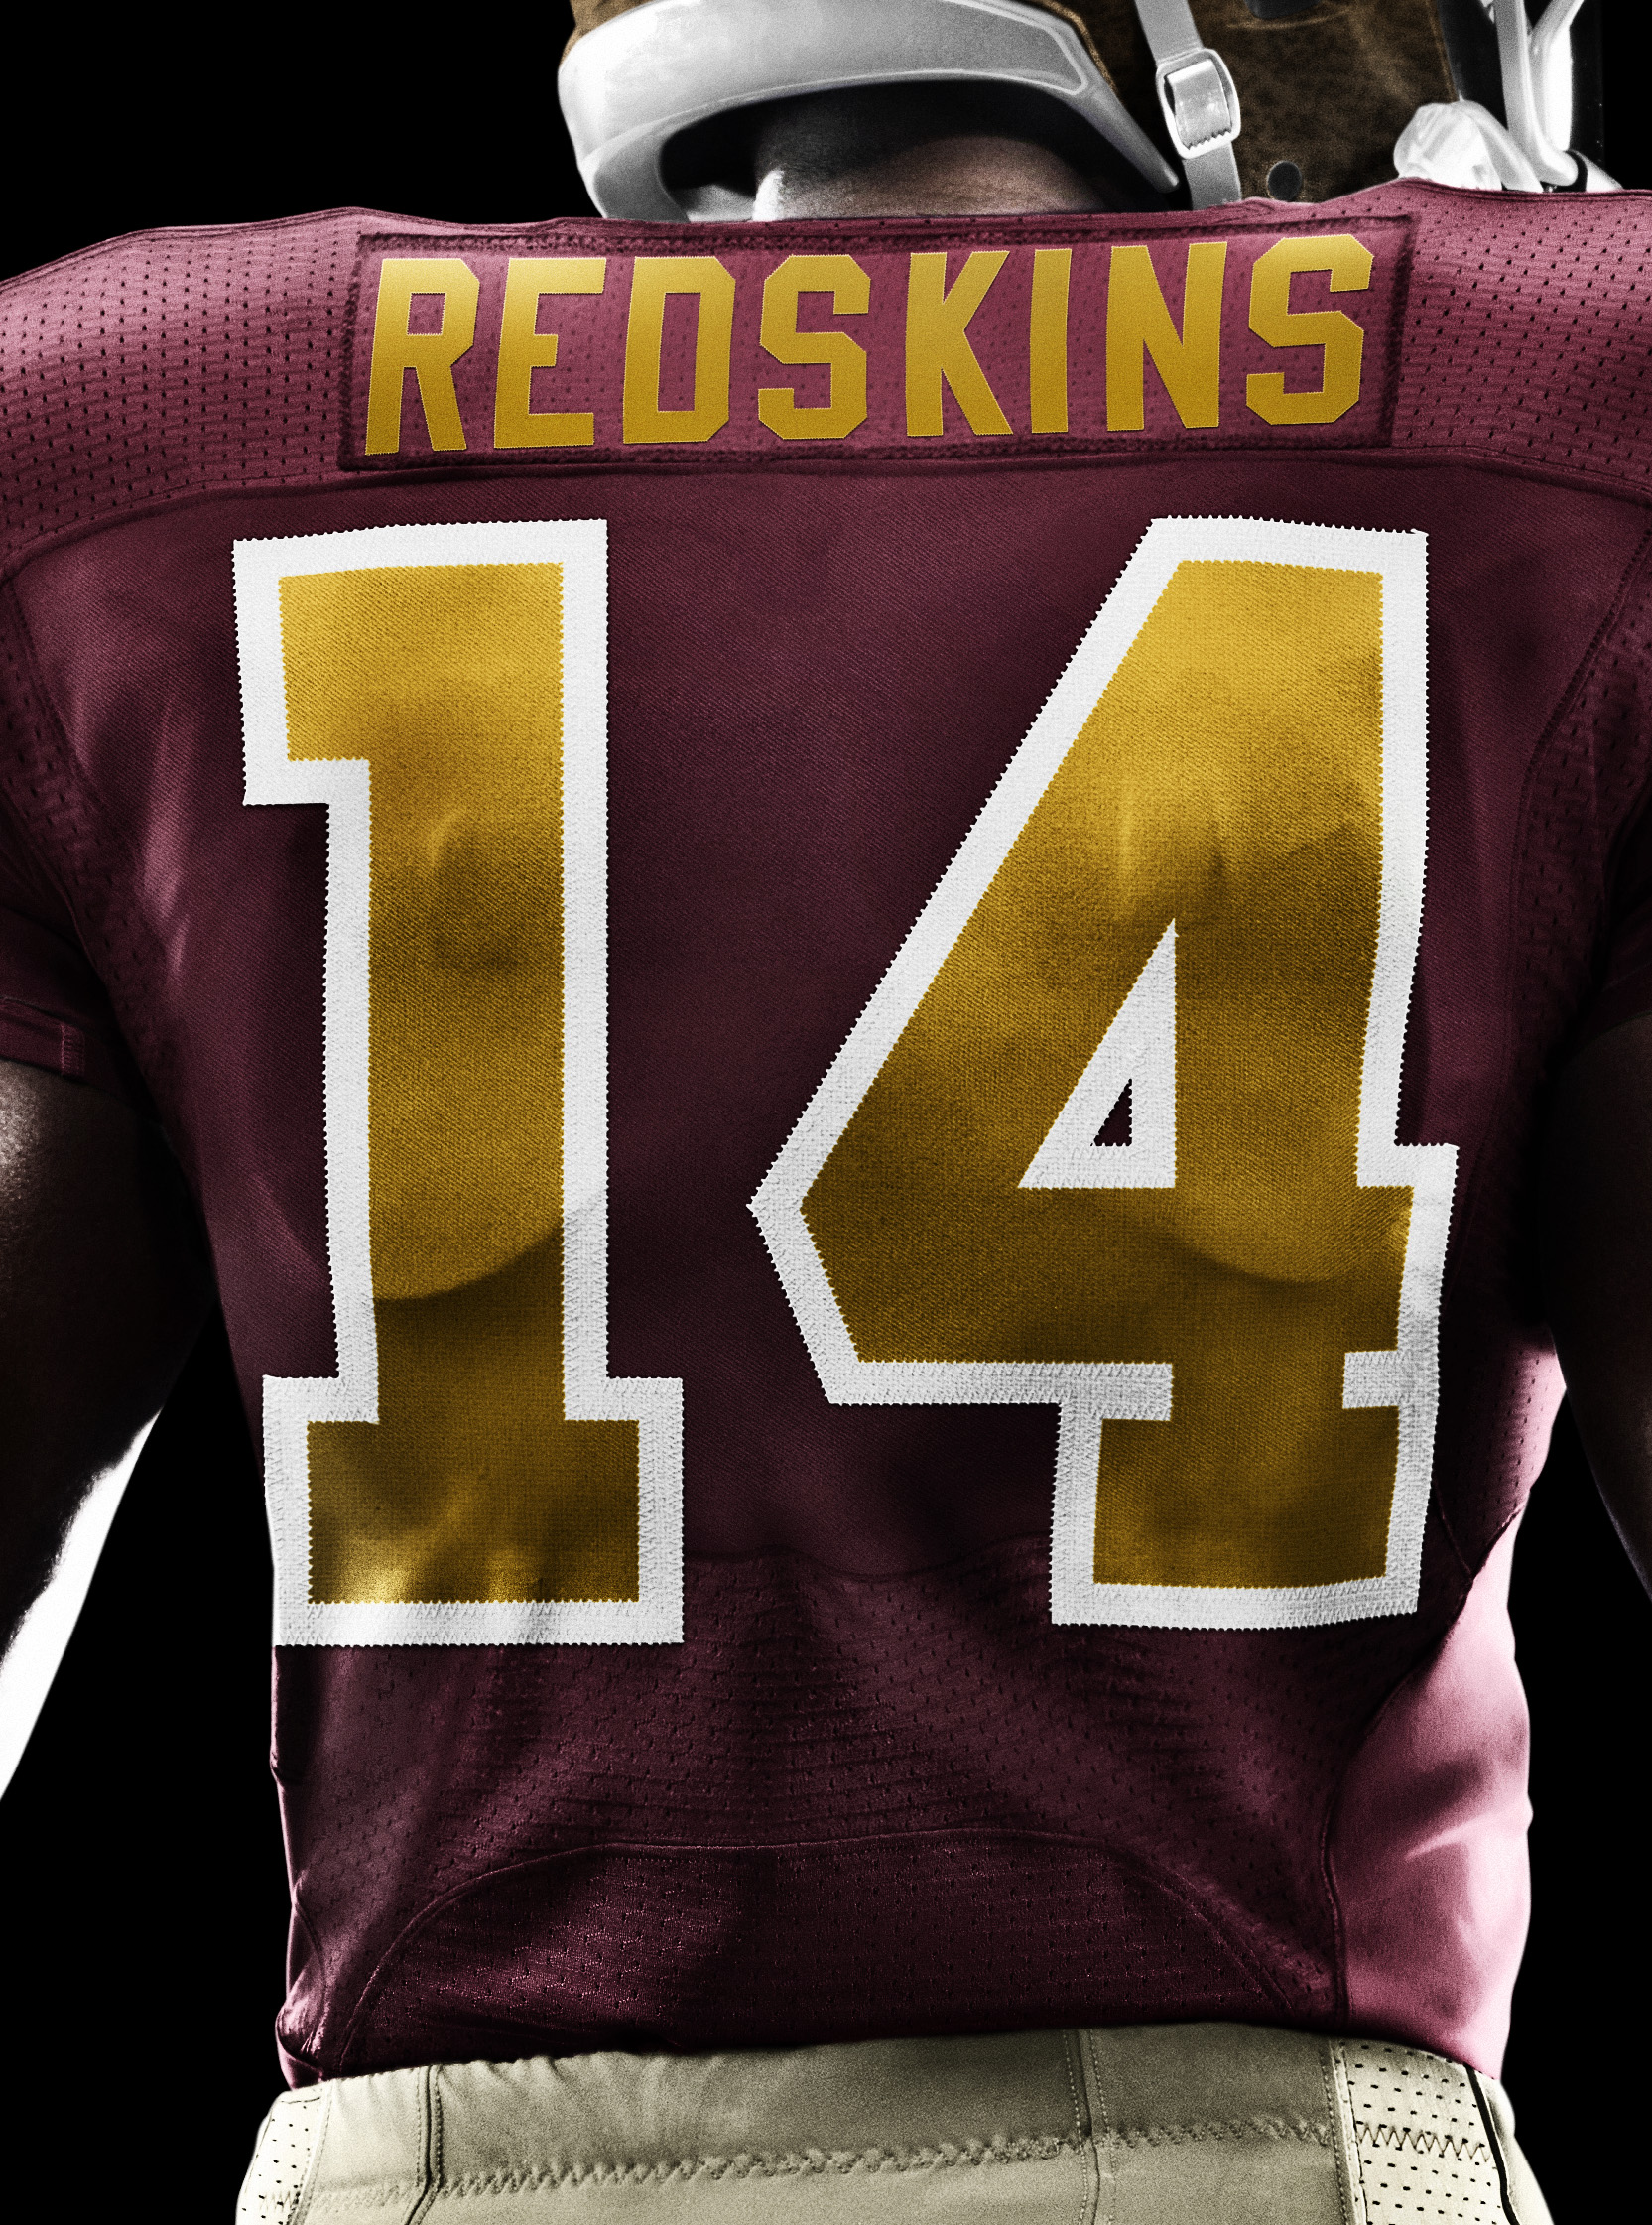 Washington Redskins Unveil New Nike Anniversary Uniform. Download Image: LO  · HI